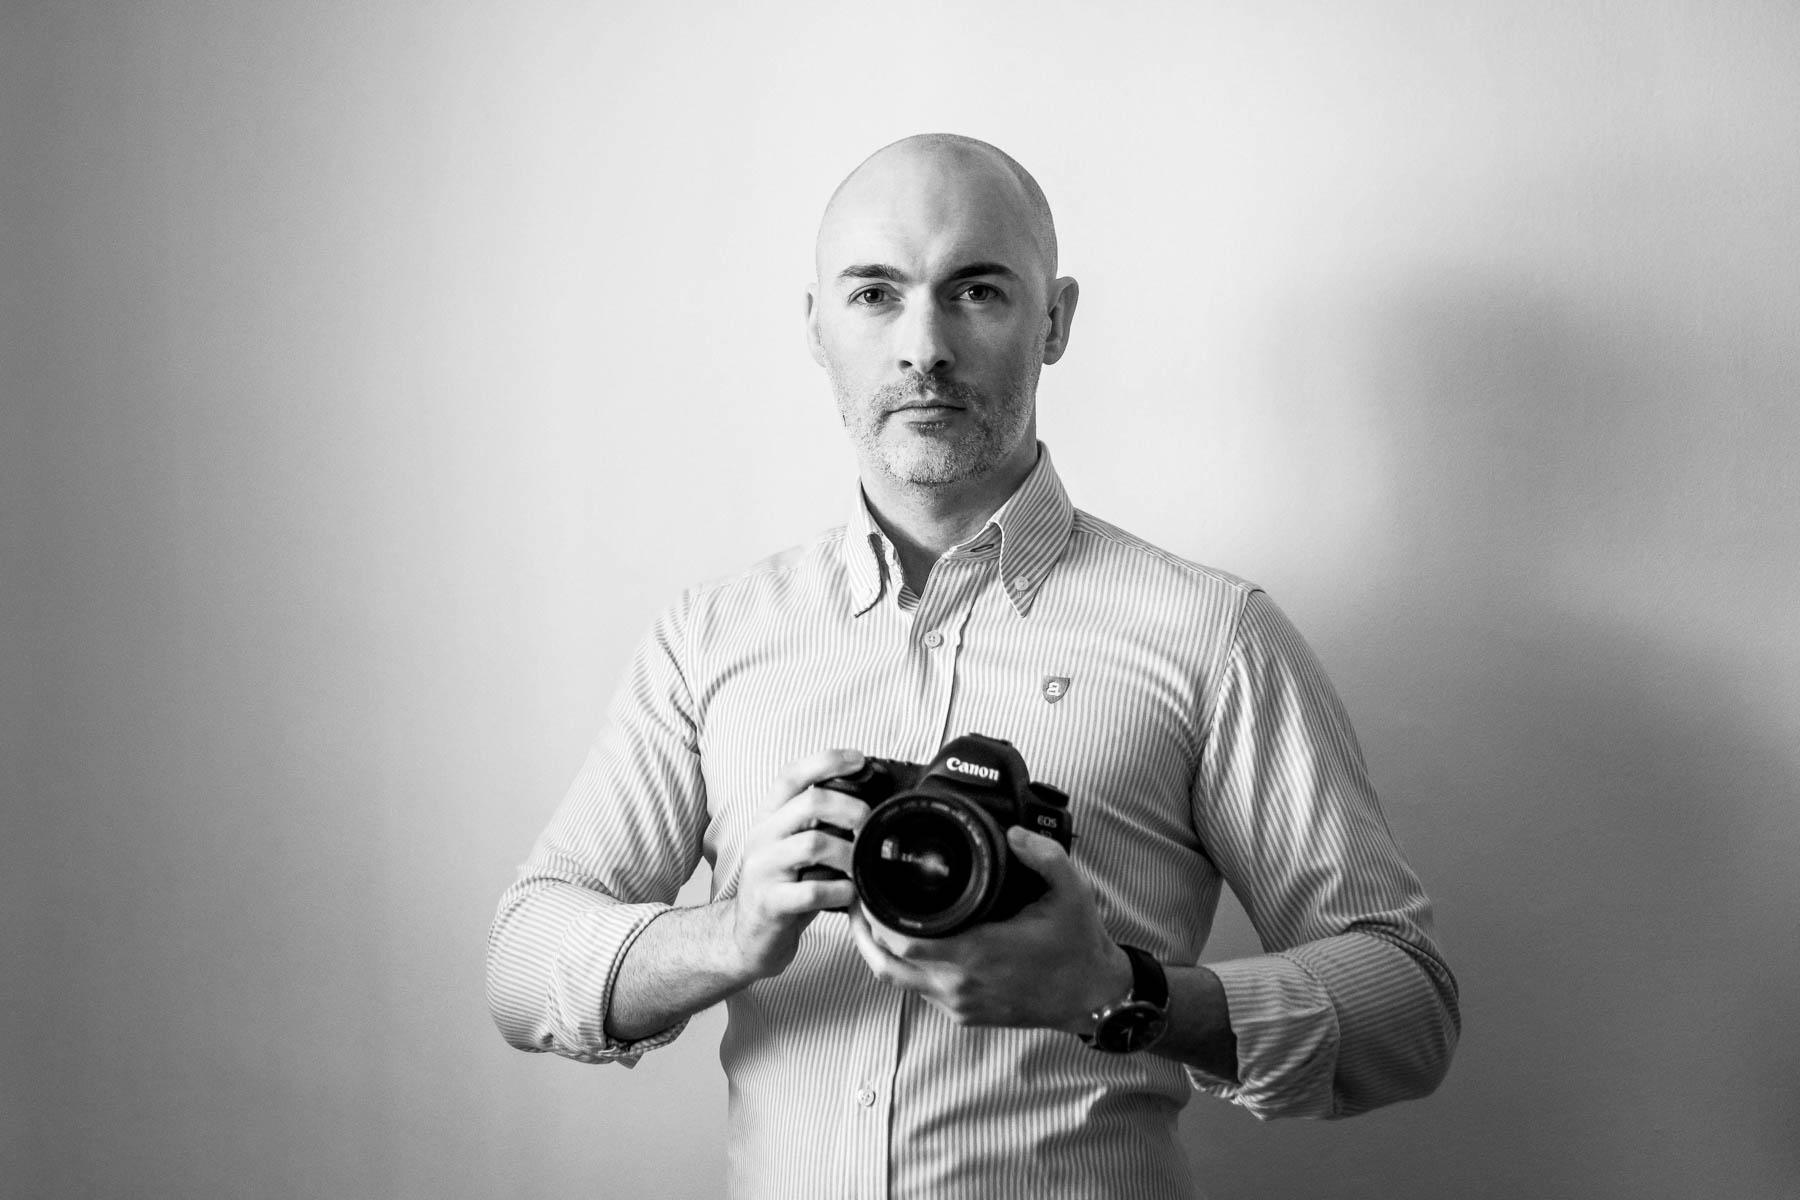 Rafa Martino - Diseño web personalizado para fotógrafos